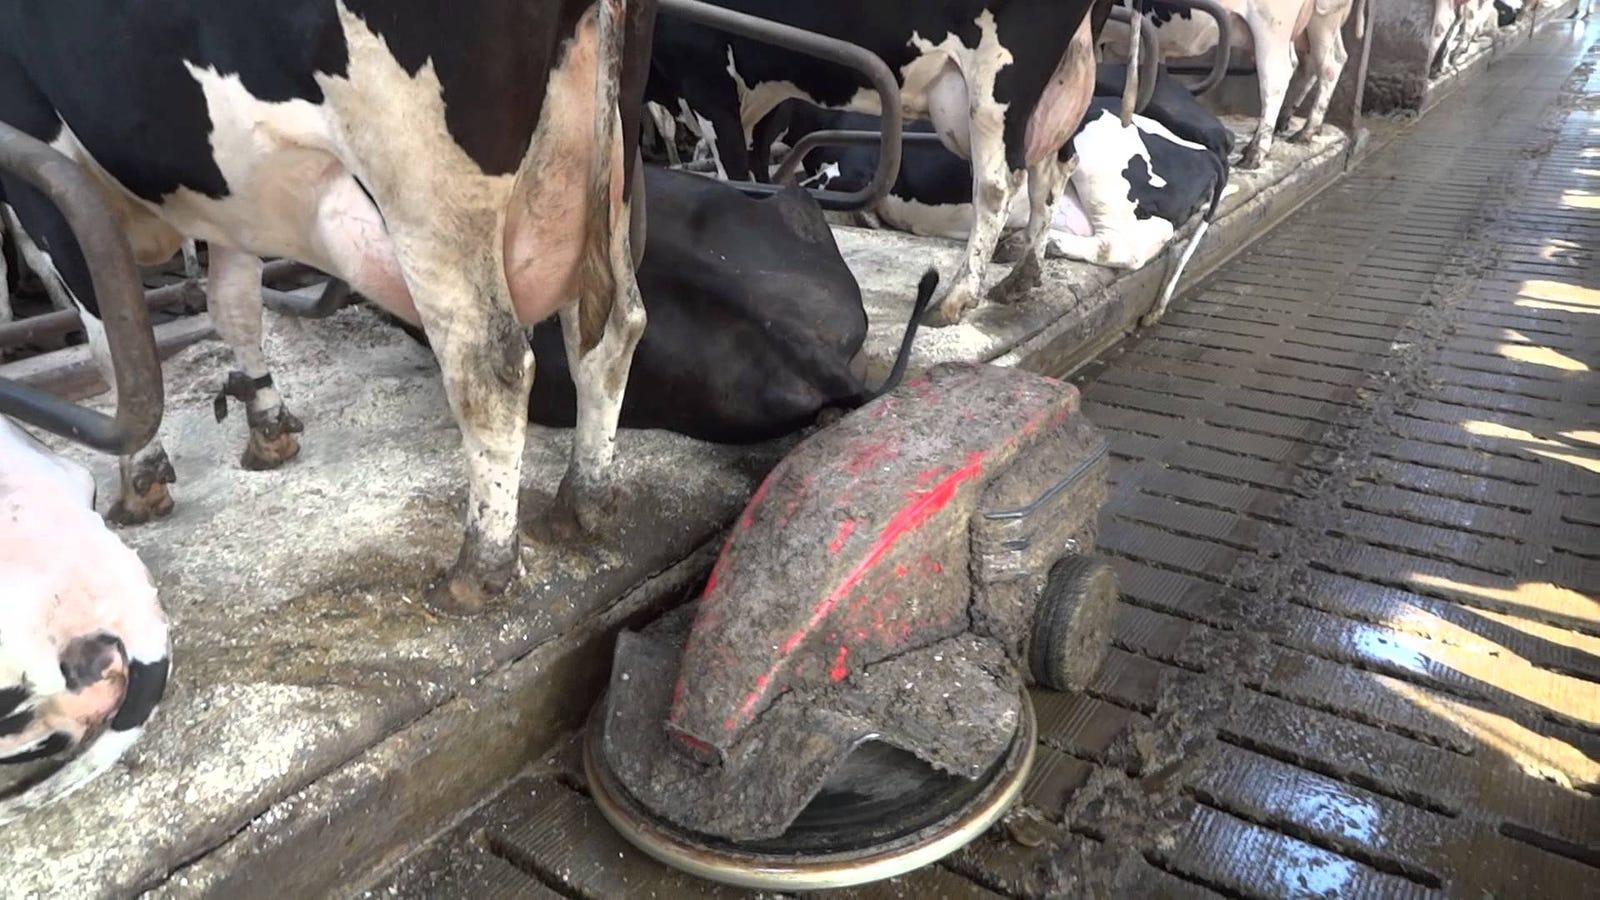 amul milk v s loose milk Home essays amul chocolate amul chocolate topics: milk essay on amul milk v s loose milk.